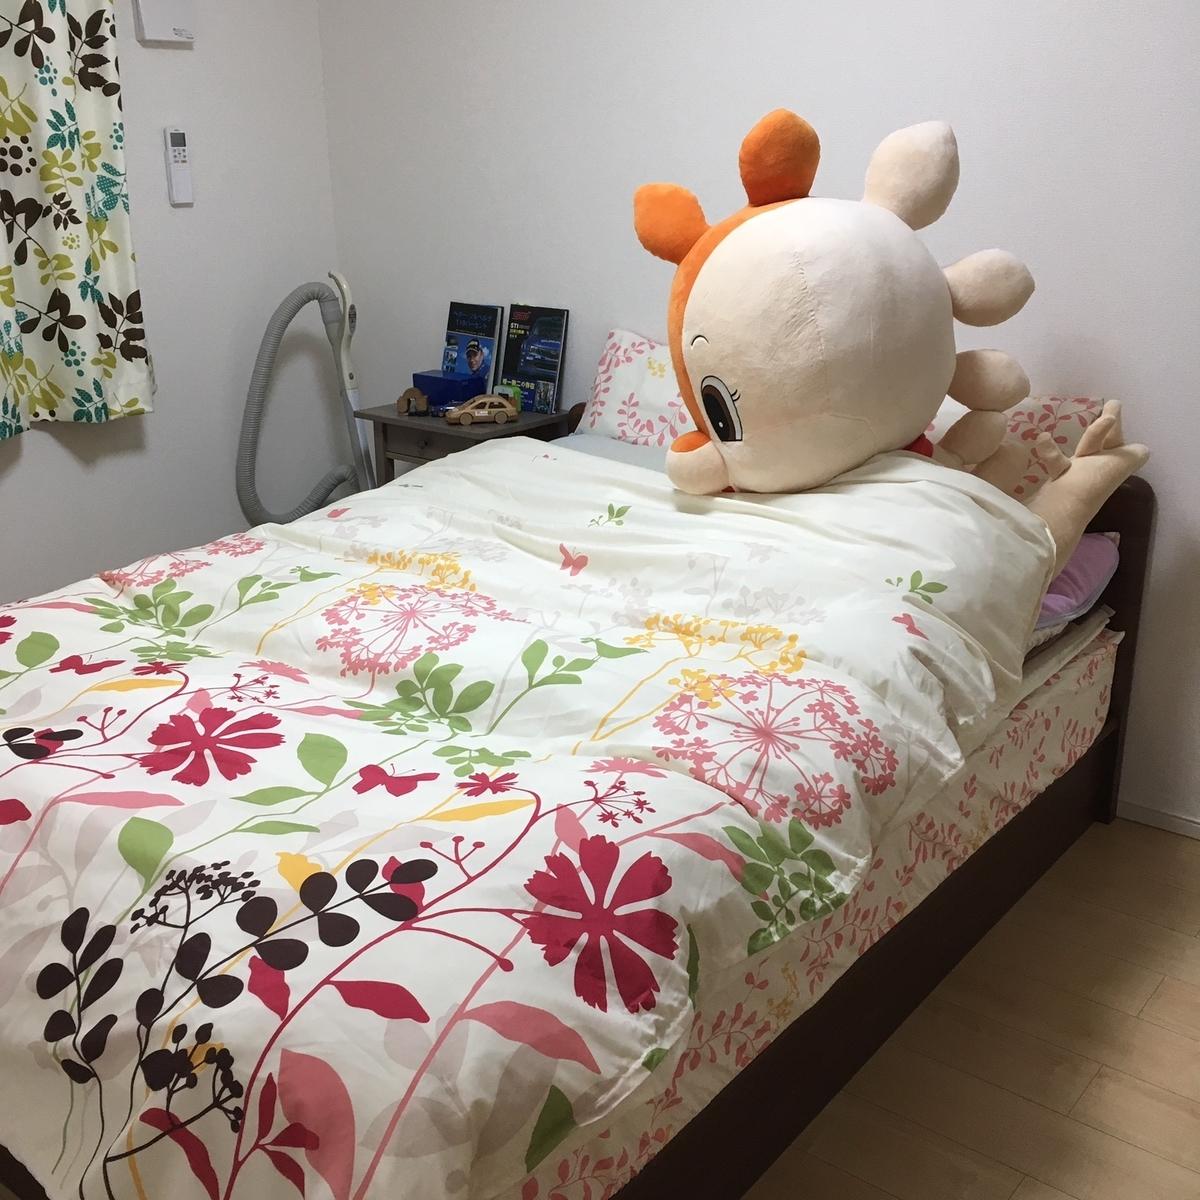 f:id:amane-yuuna:20190628225156j:plain